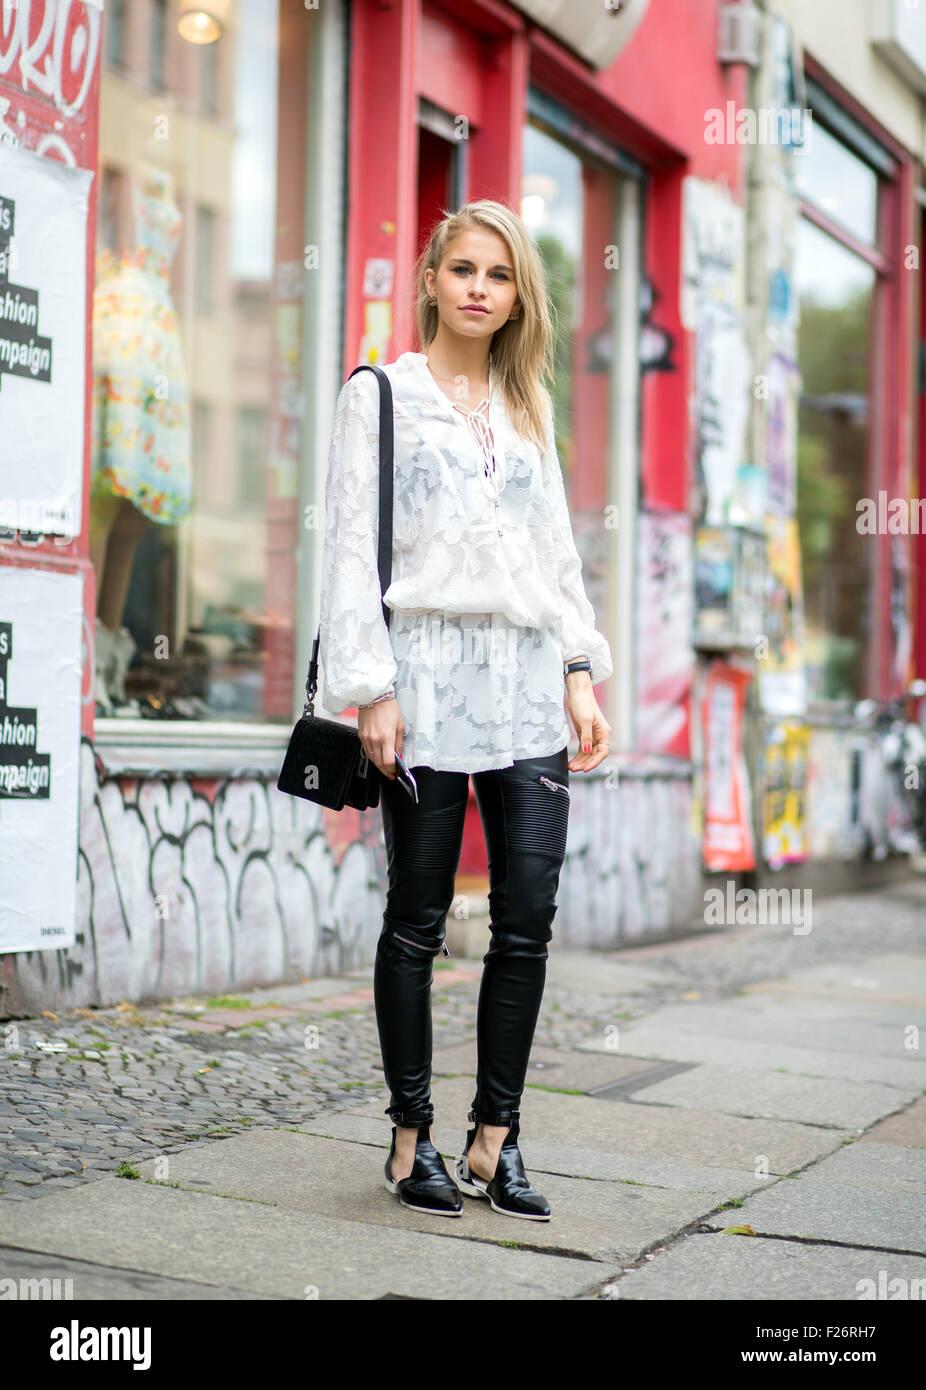 Mercedes Benz Fashion Week Berlin Spring Summer 2016 Streetstyle Stock Photo Royalty Free